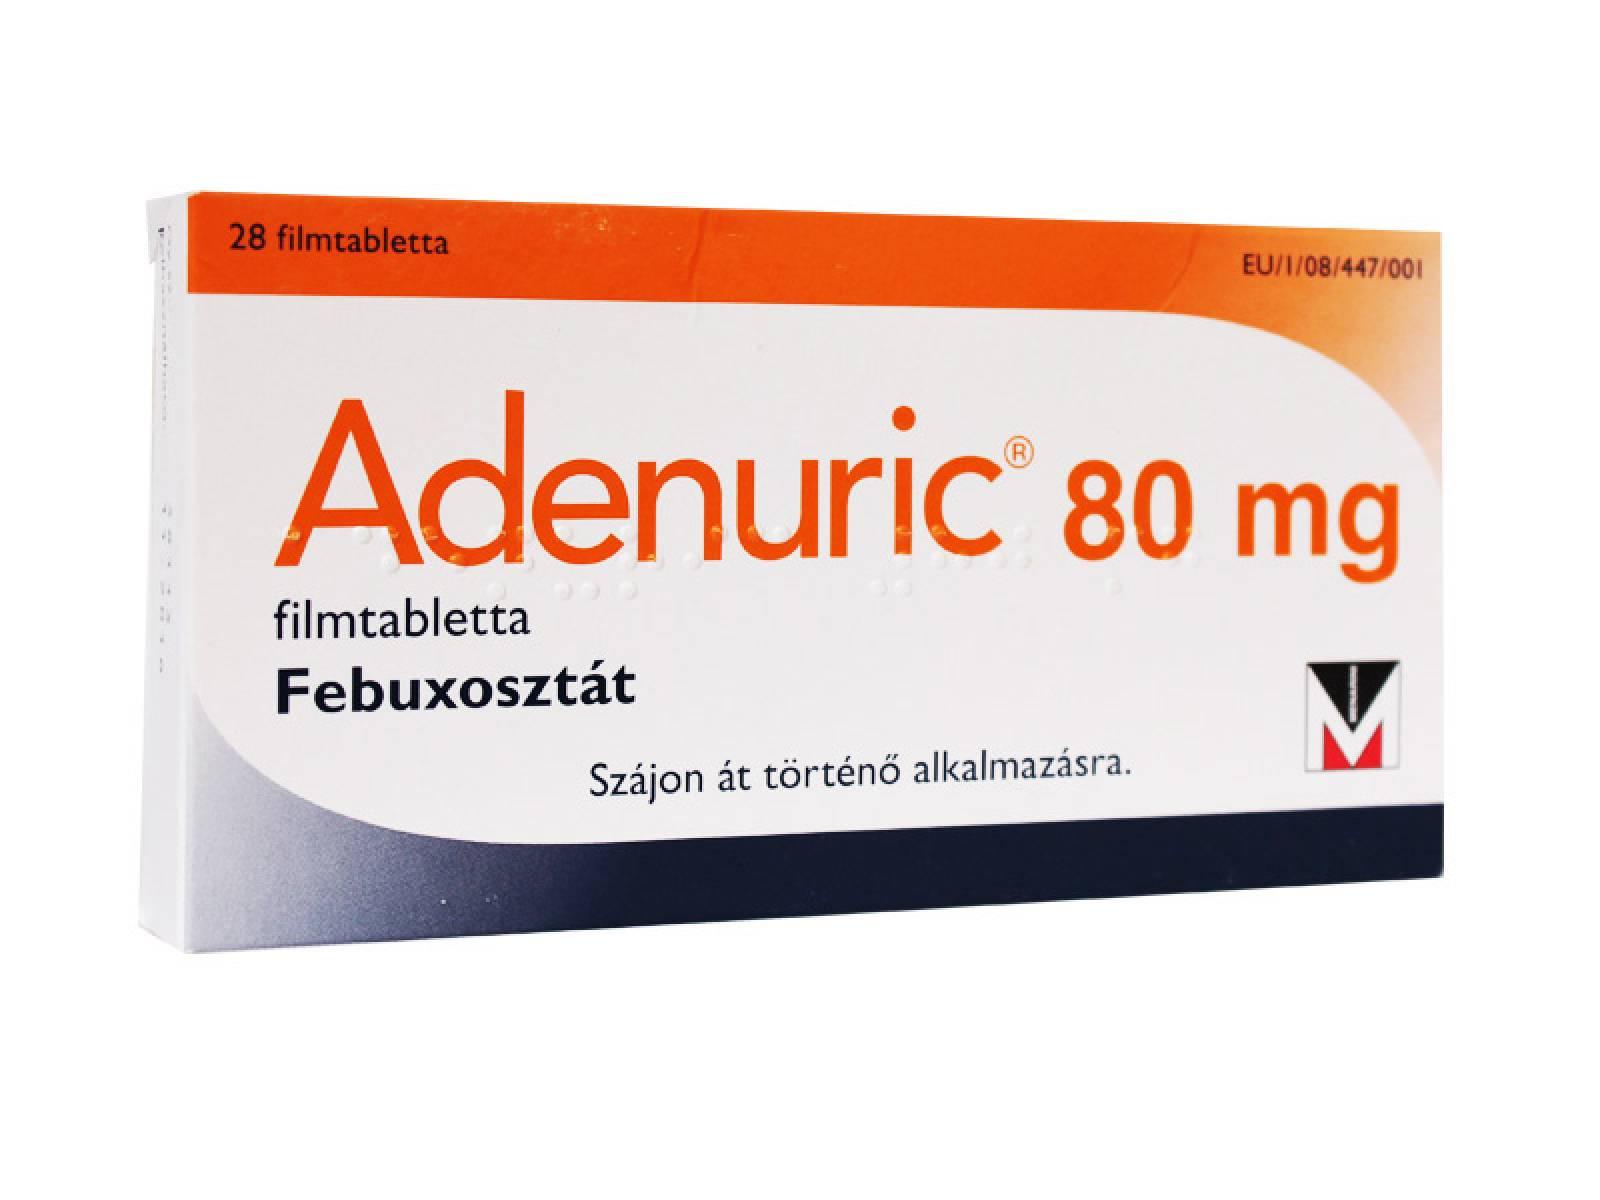 Фото препарата Аденурик таблетки покрытые пленочной оболочкой 80 мг блистер